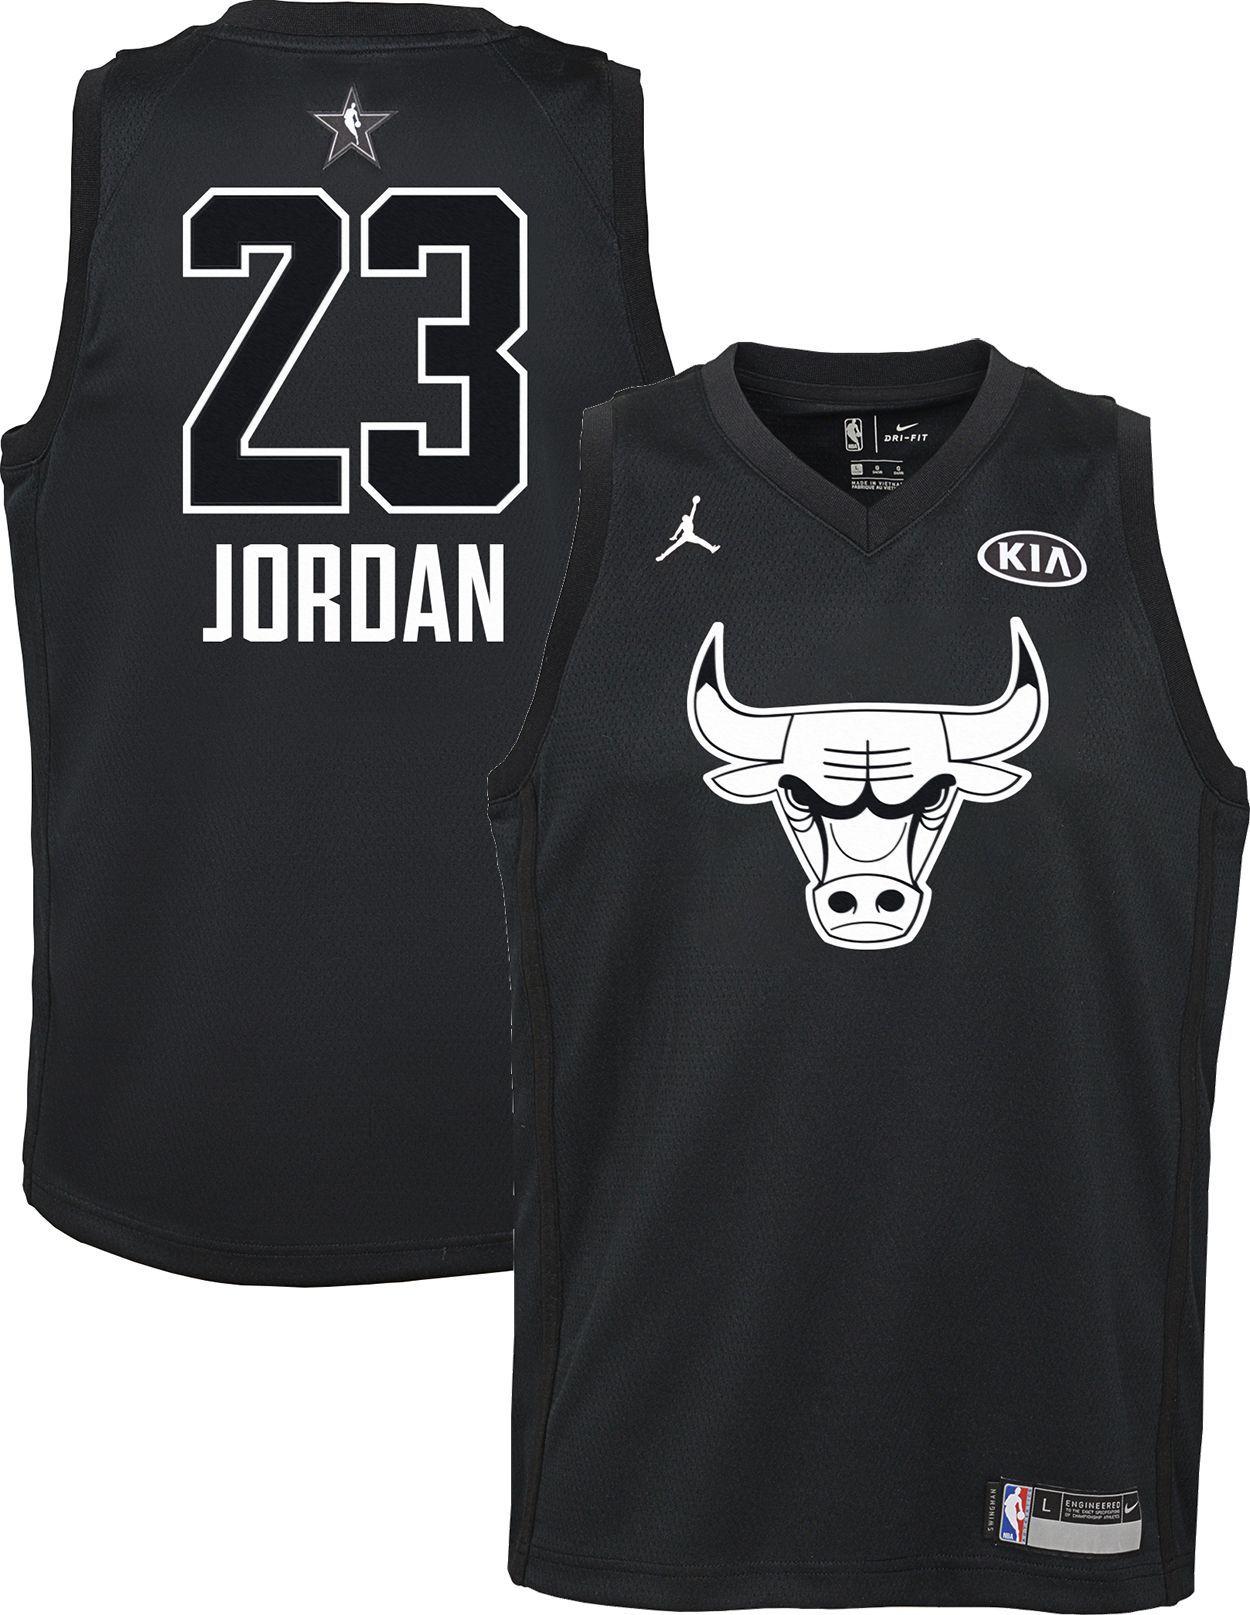 100% authentic f67ed aa1d6 Jordan Youth 2018 NBA All-Star Game Michael Jordan Black Dri ...